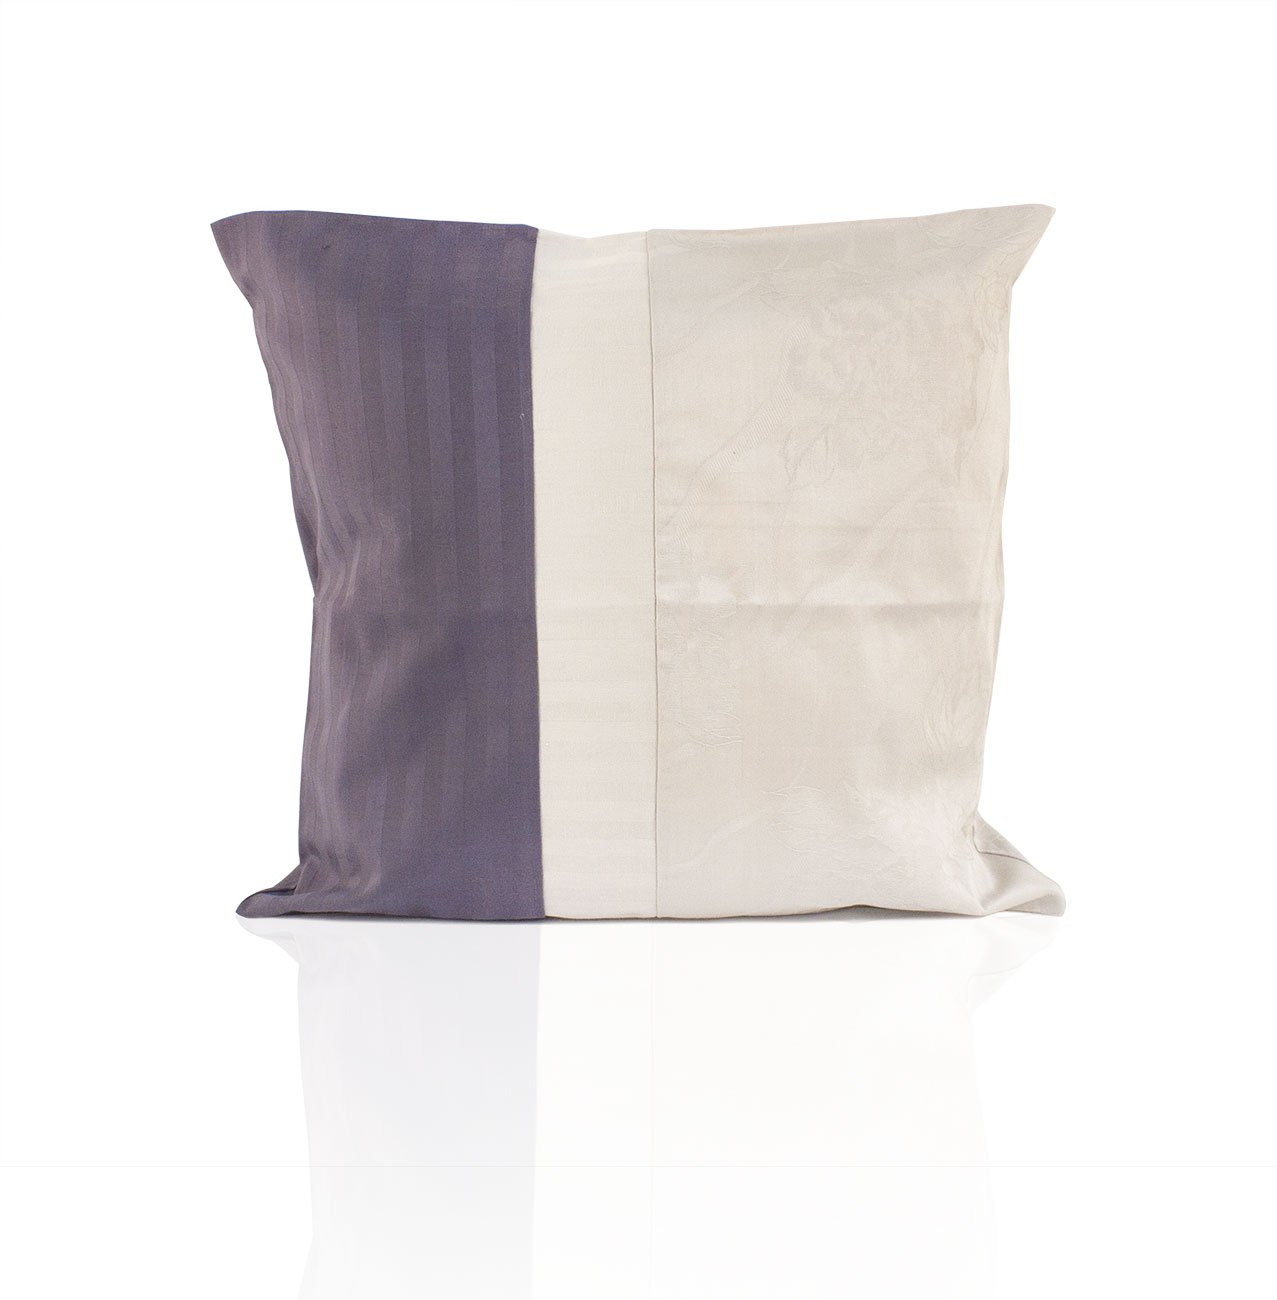 Наволочка из страйп-сатина Полоска 1x1 комби-10 серо-фиолетовый Elin